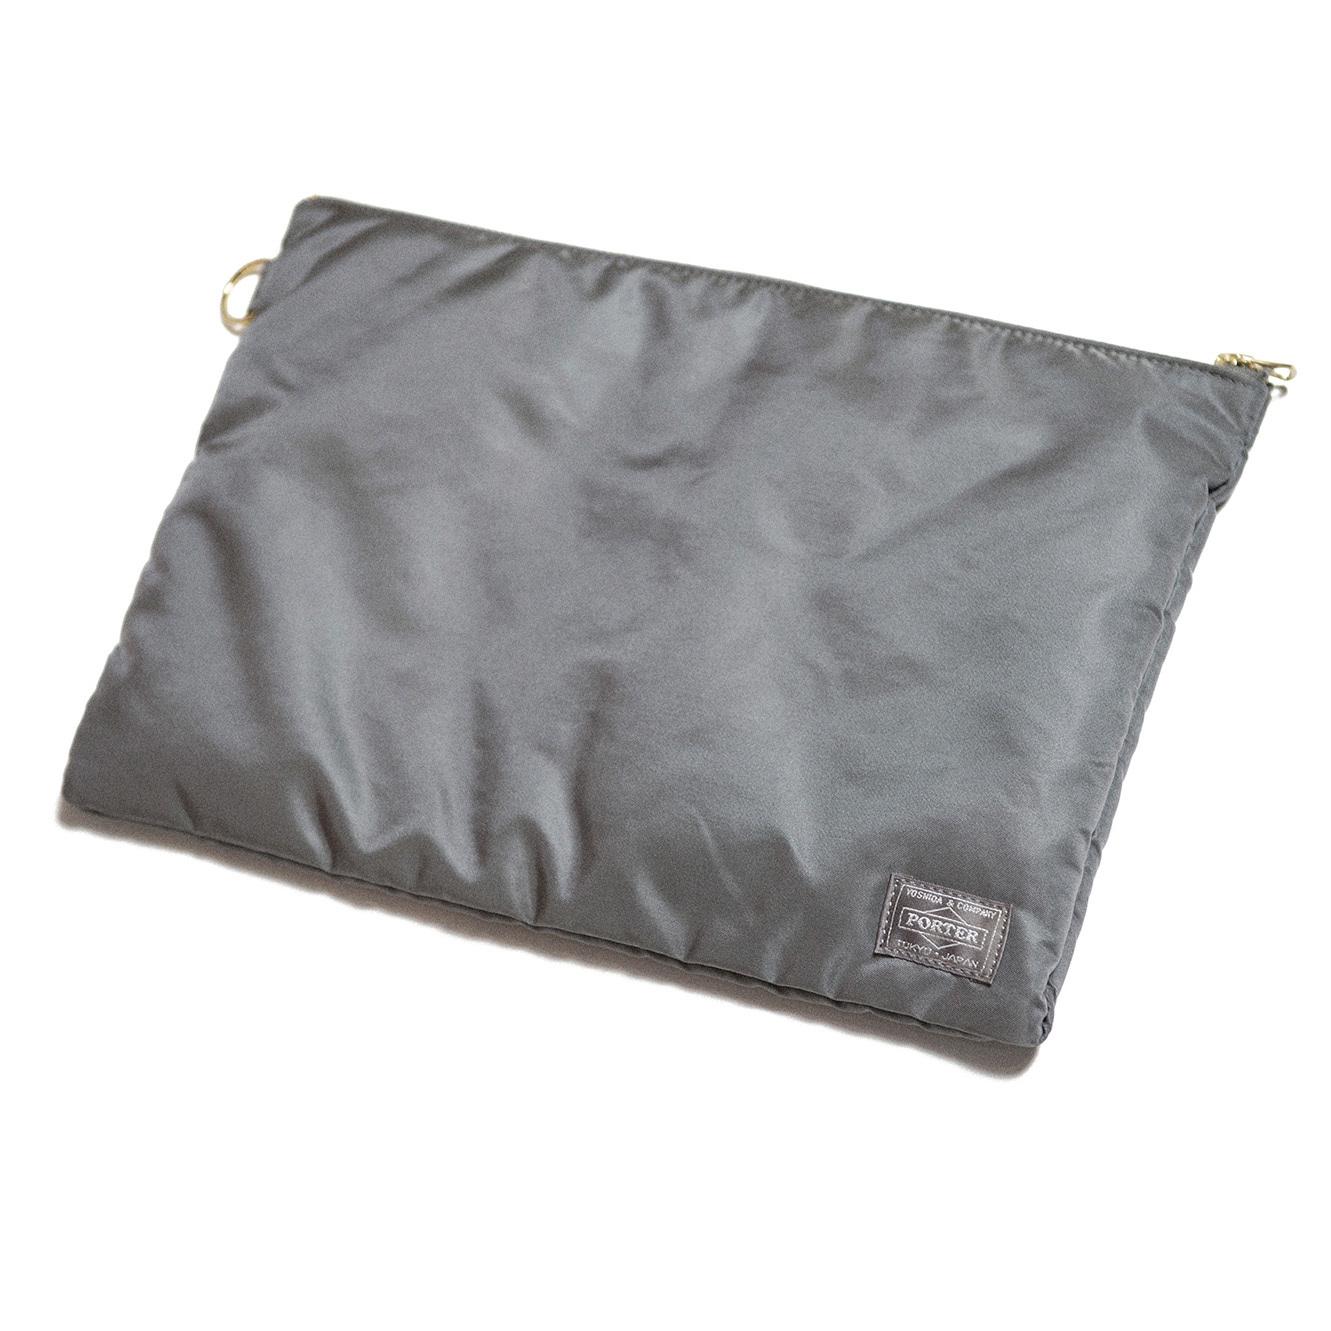 SEASONING×PORTER CLUTCH BAG - GRAY